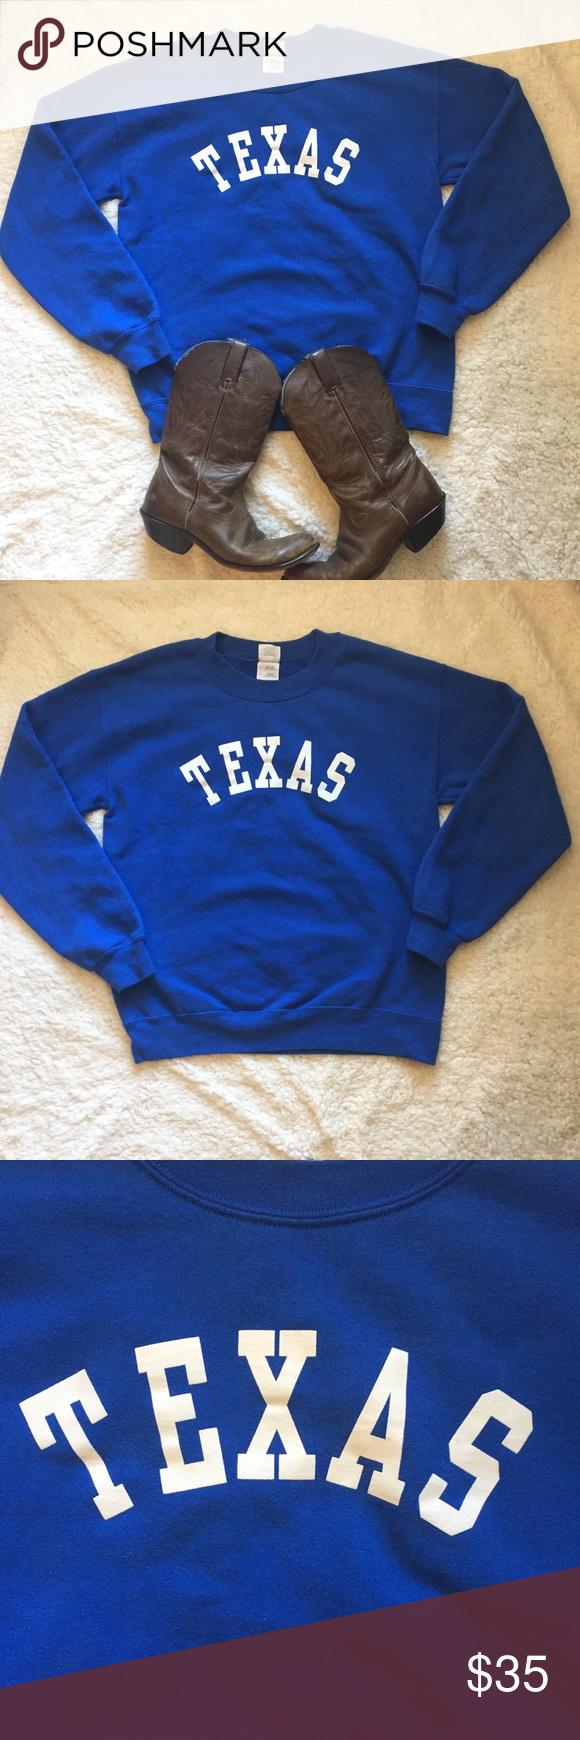 separation shoes 65631 15b08 Vintage Texas Rangers Pullover Blue Sweatshirt So cute ...